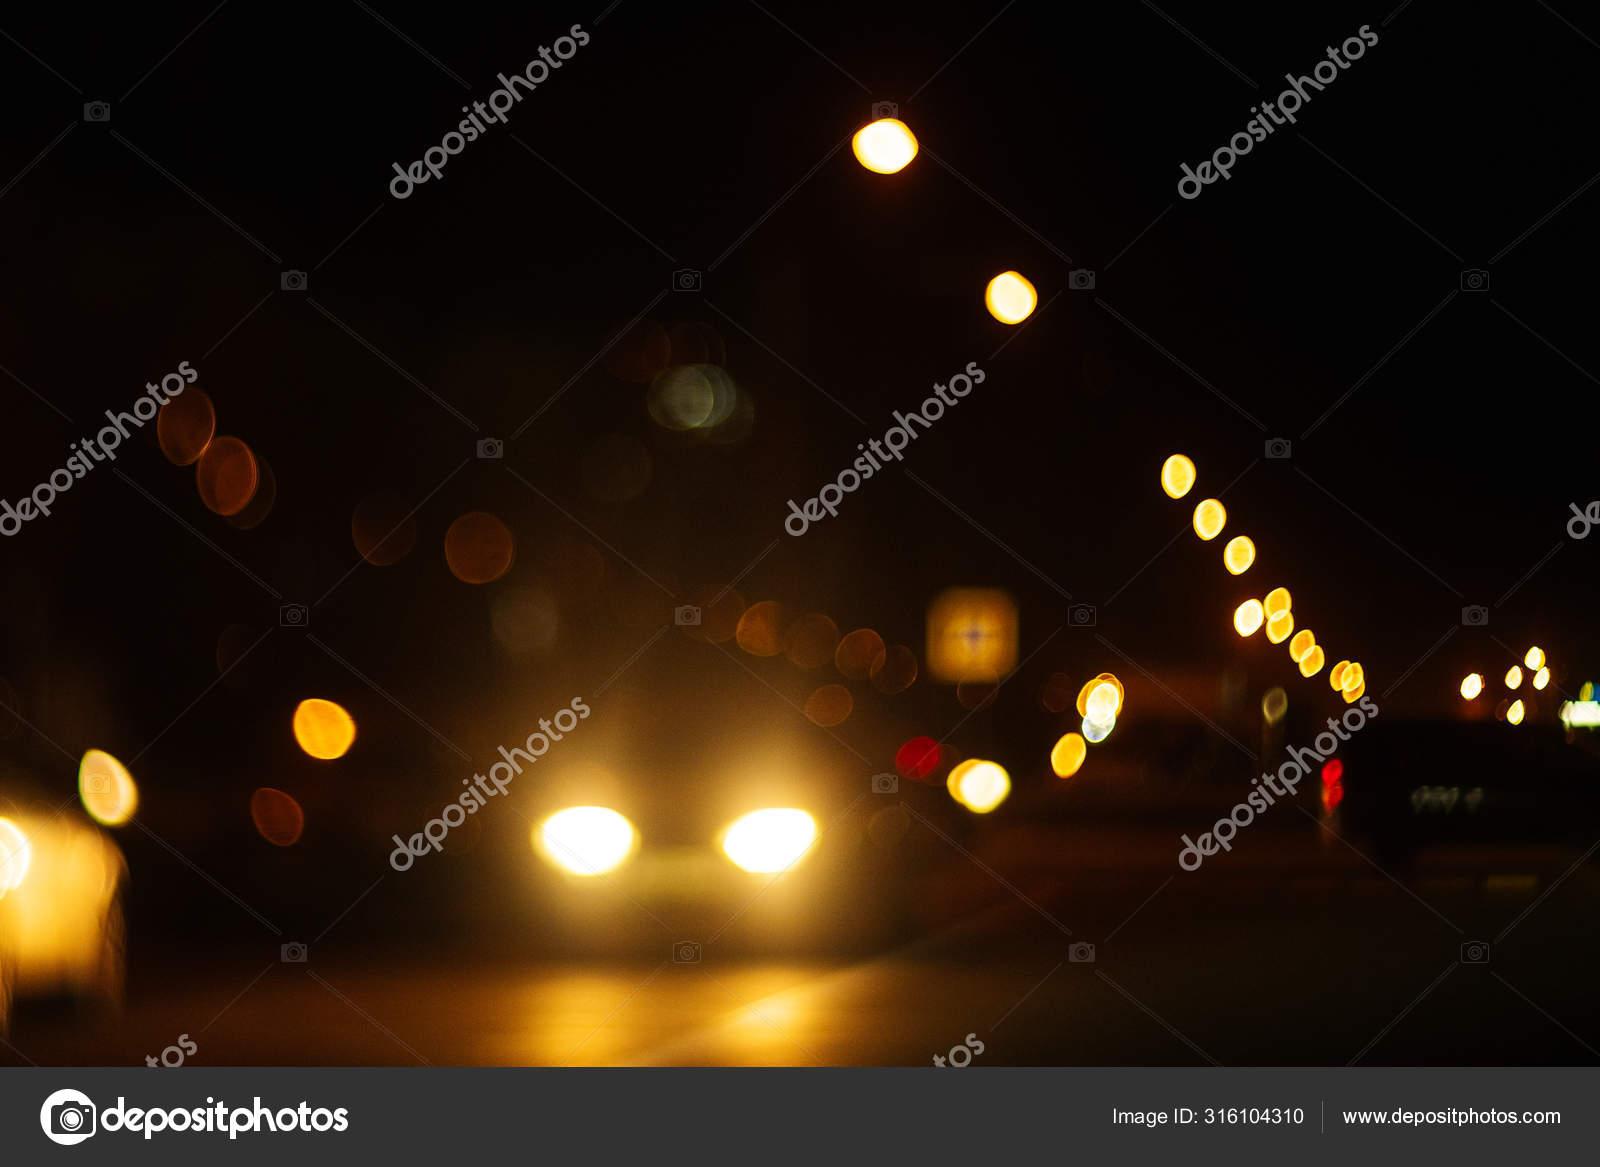 Blur Bokeh Of Car On The Road Blur Traffic At Night Stock Photo C Iamstasivanov Gmail Com 316104310